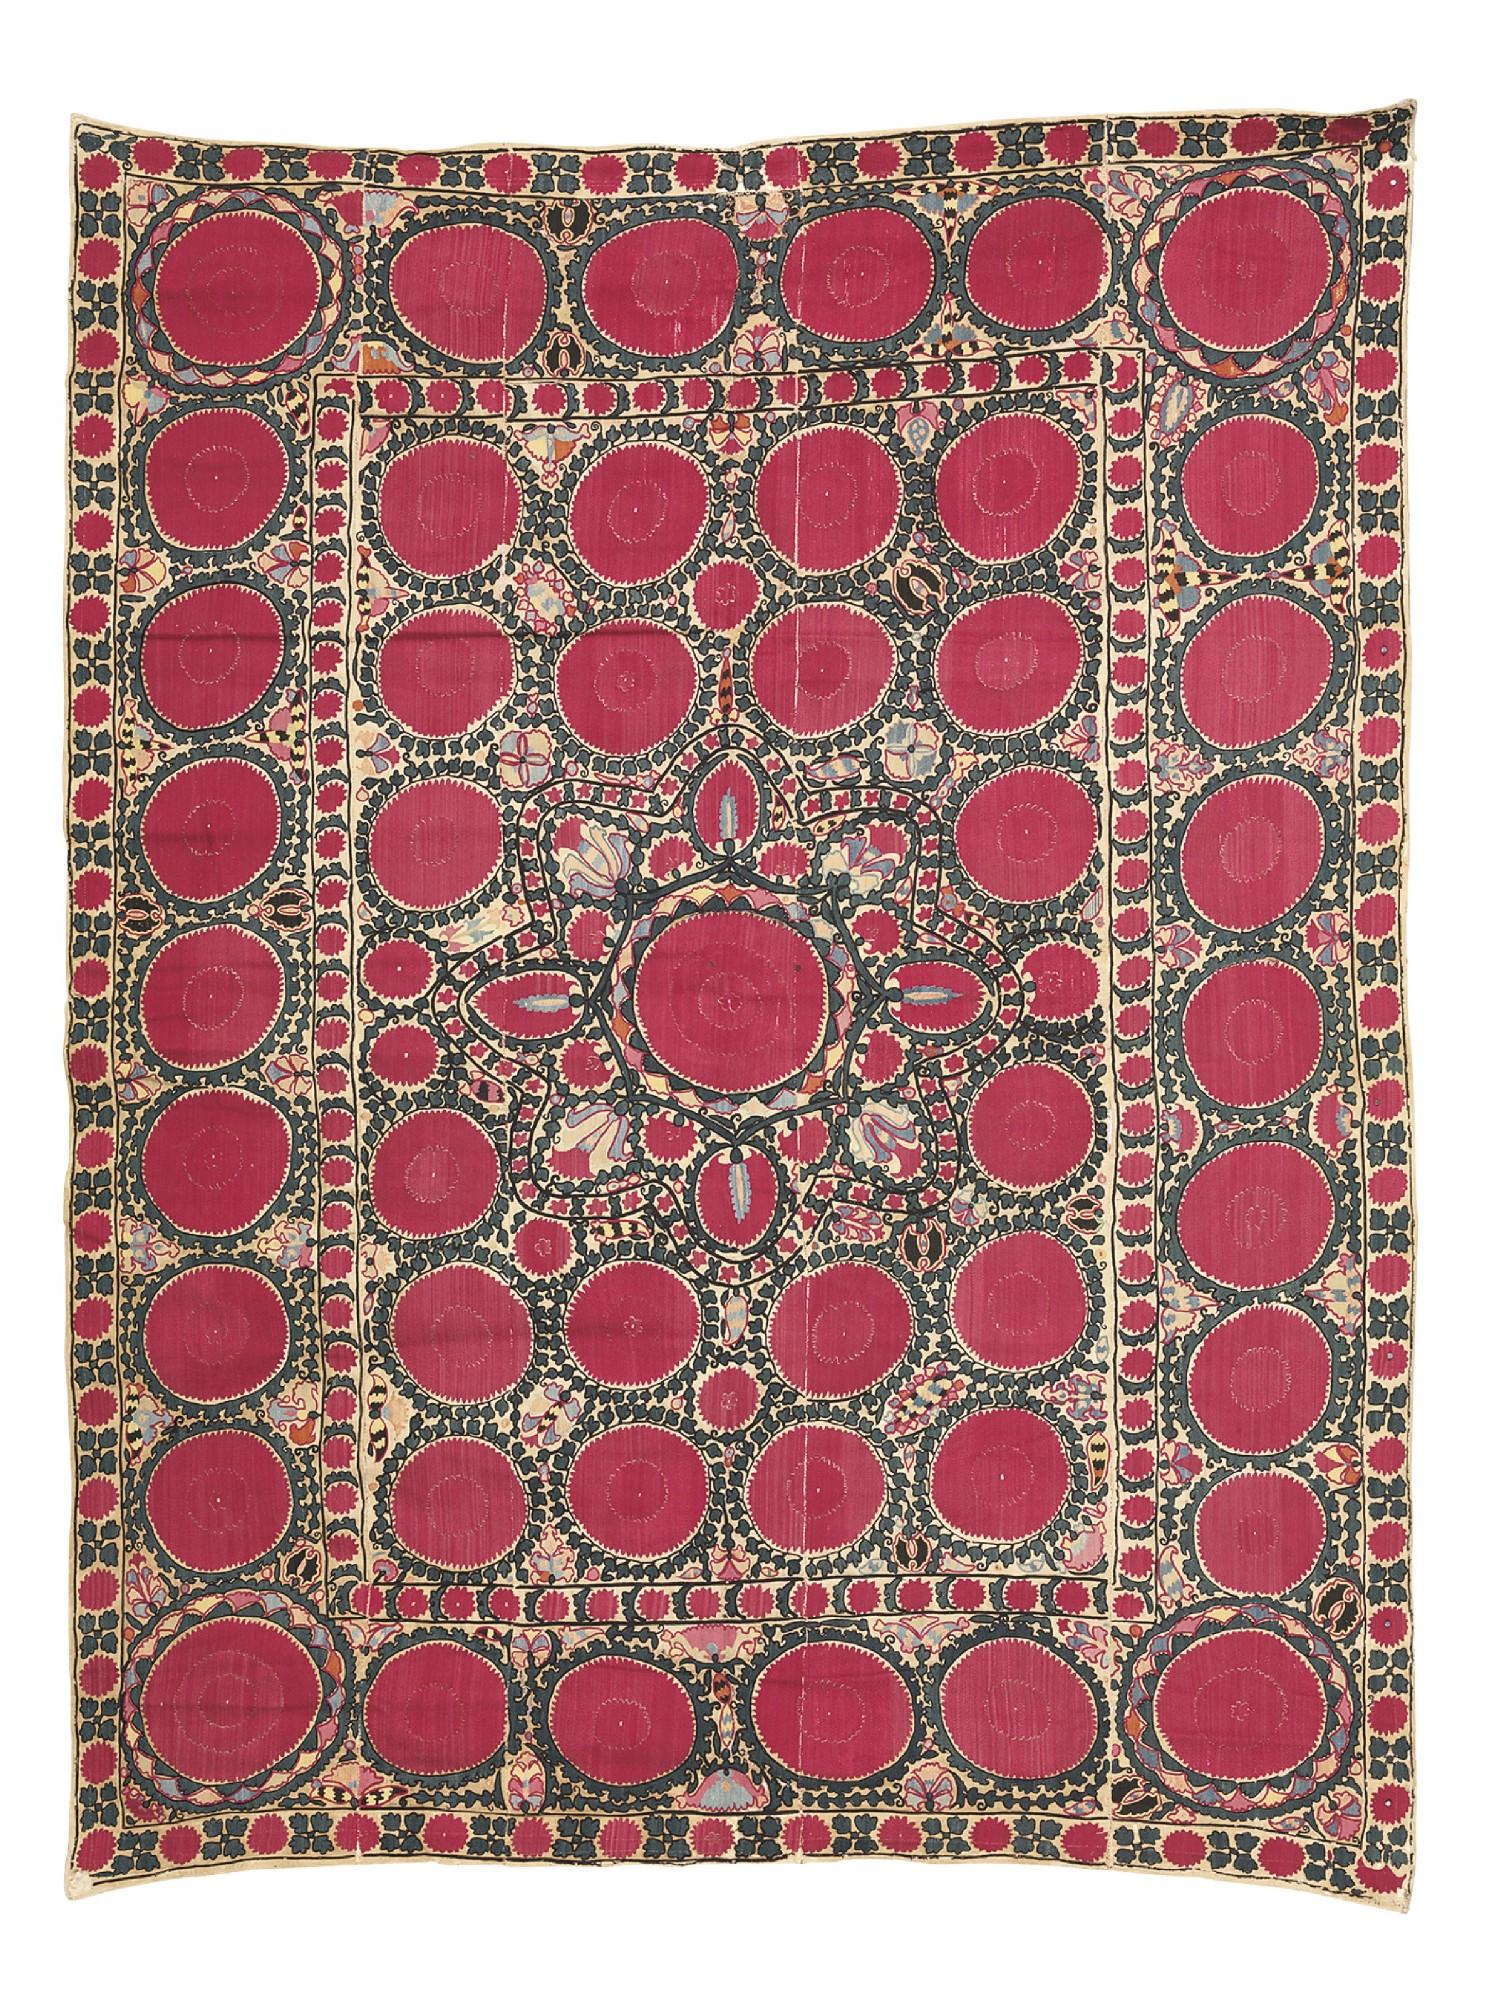 A Suzani and Chinese silk embr